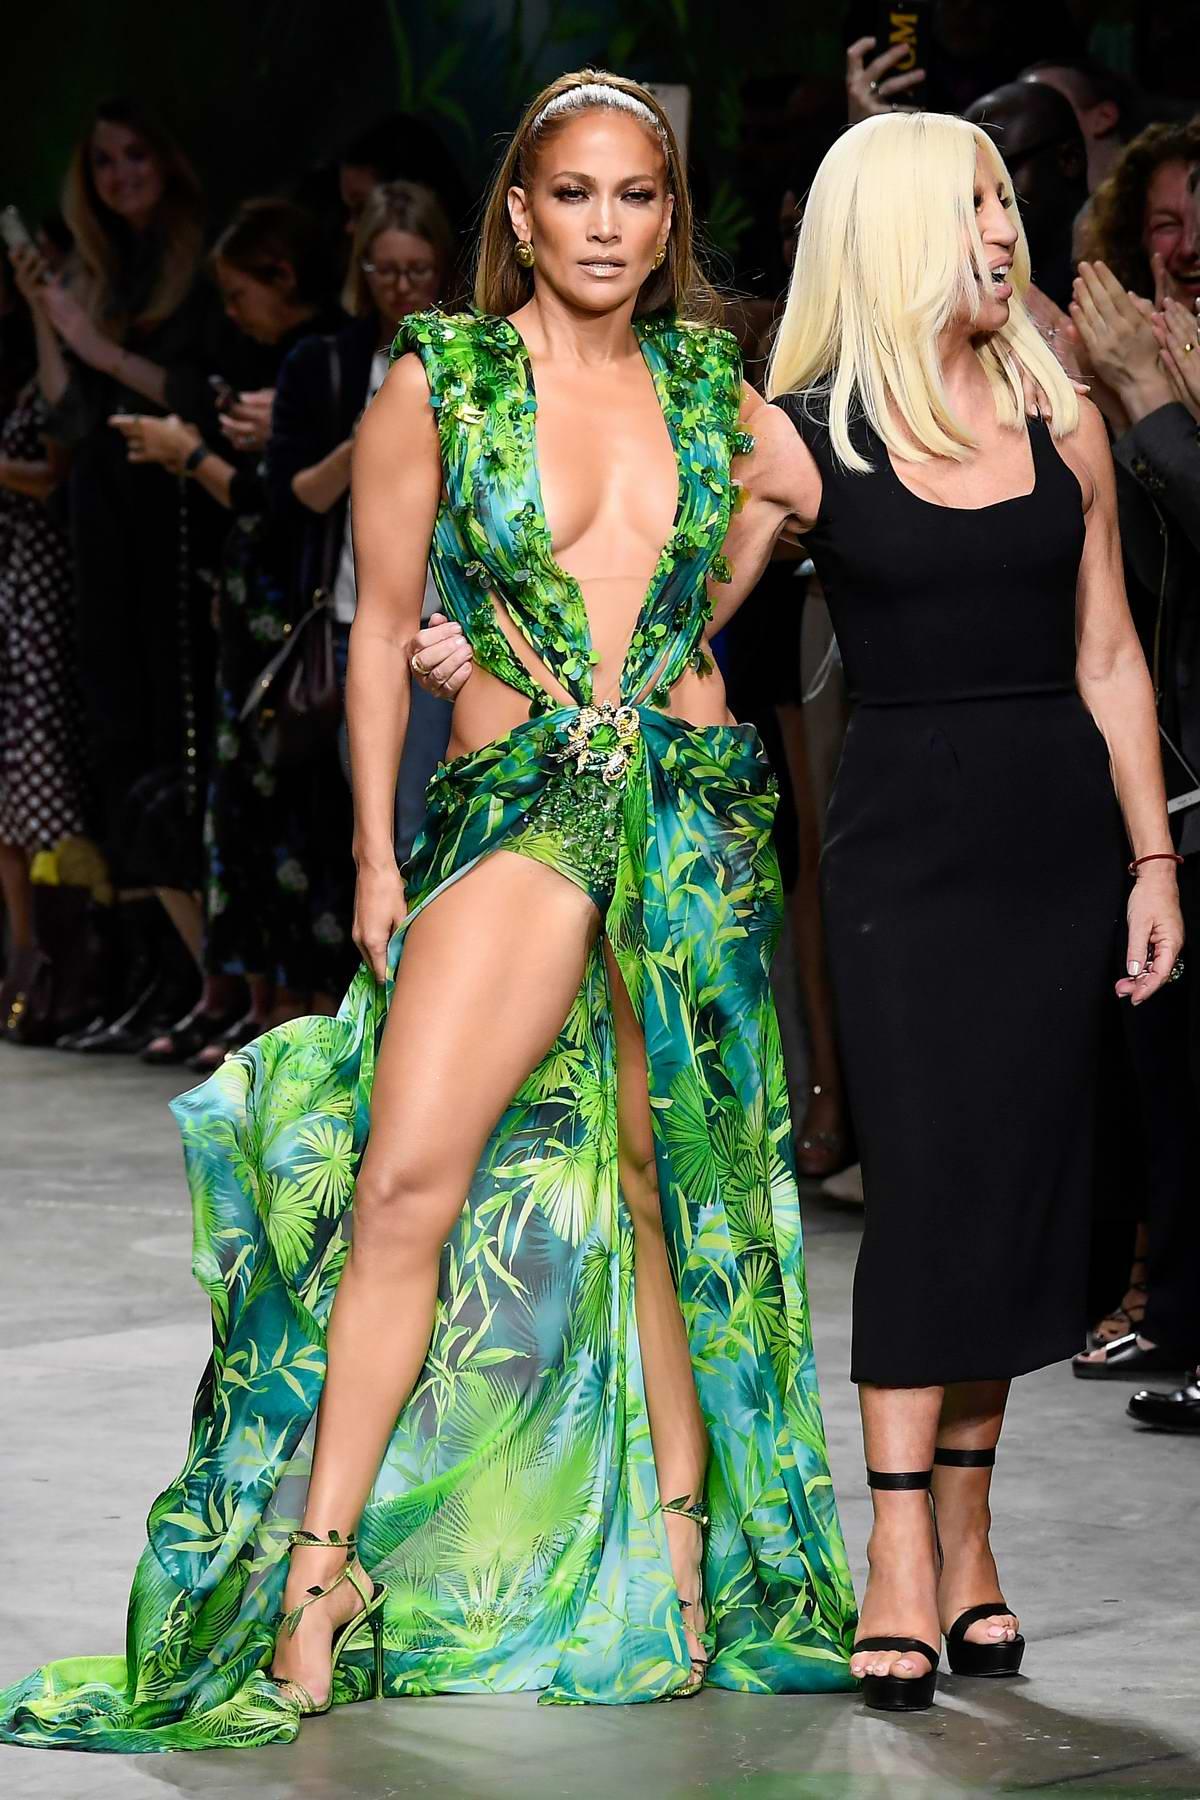 Jennifer Lopez walks the runway at the Versace show during Milan Fashion Week, Spring/Summer 2020 in Milan, Italy